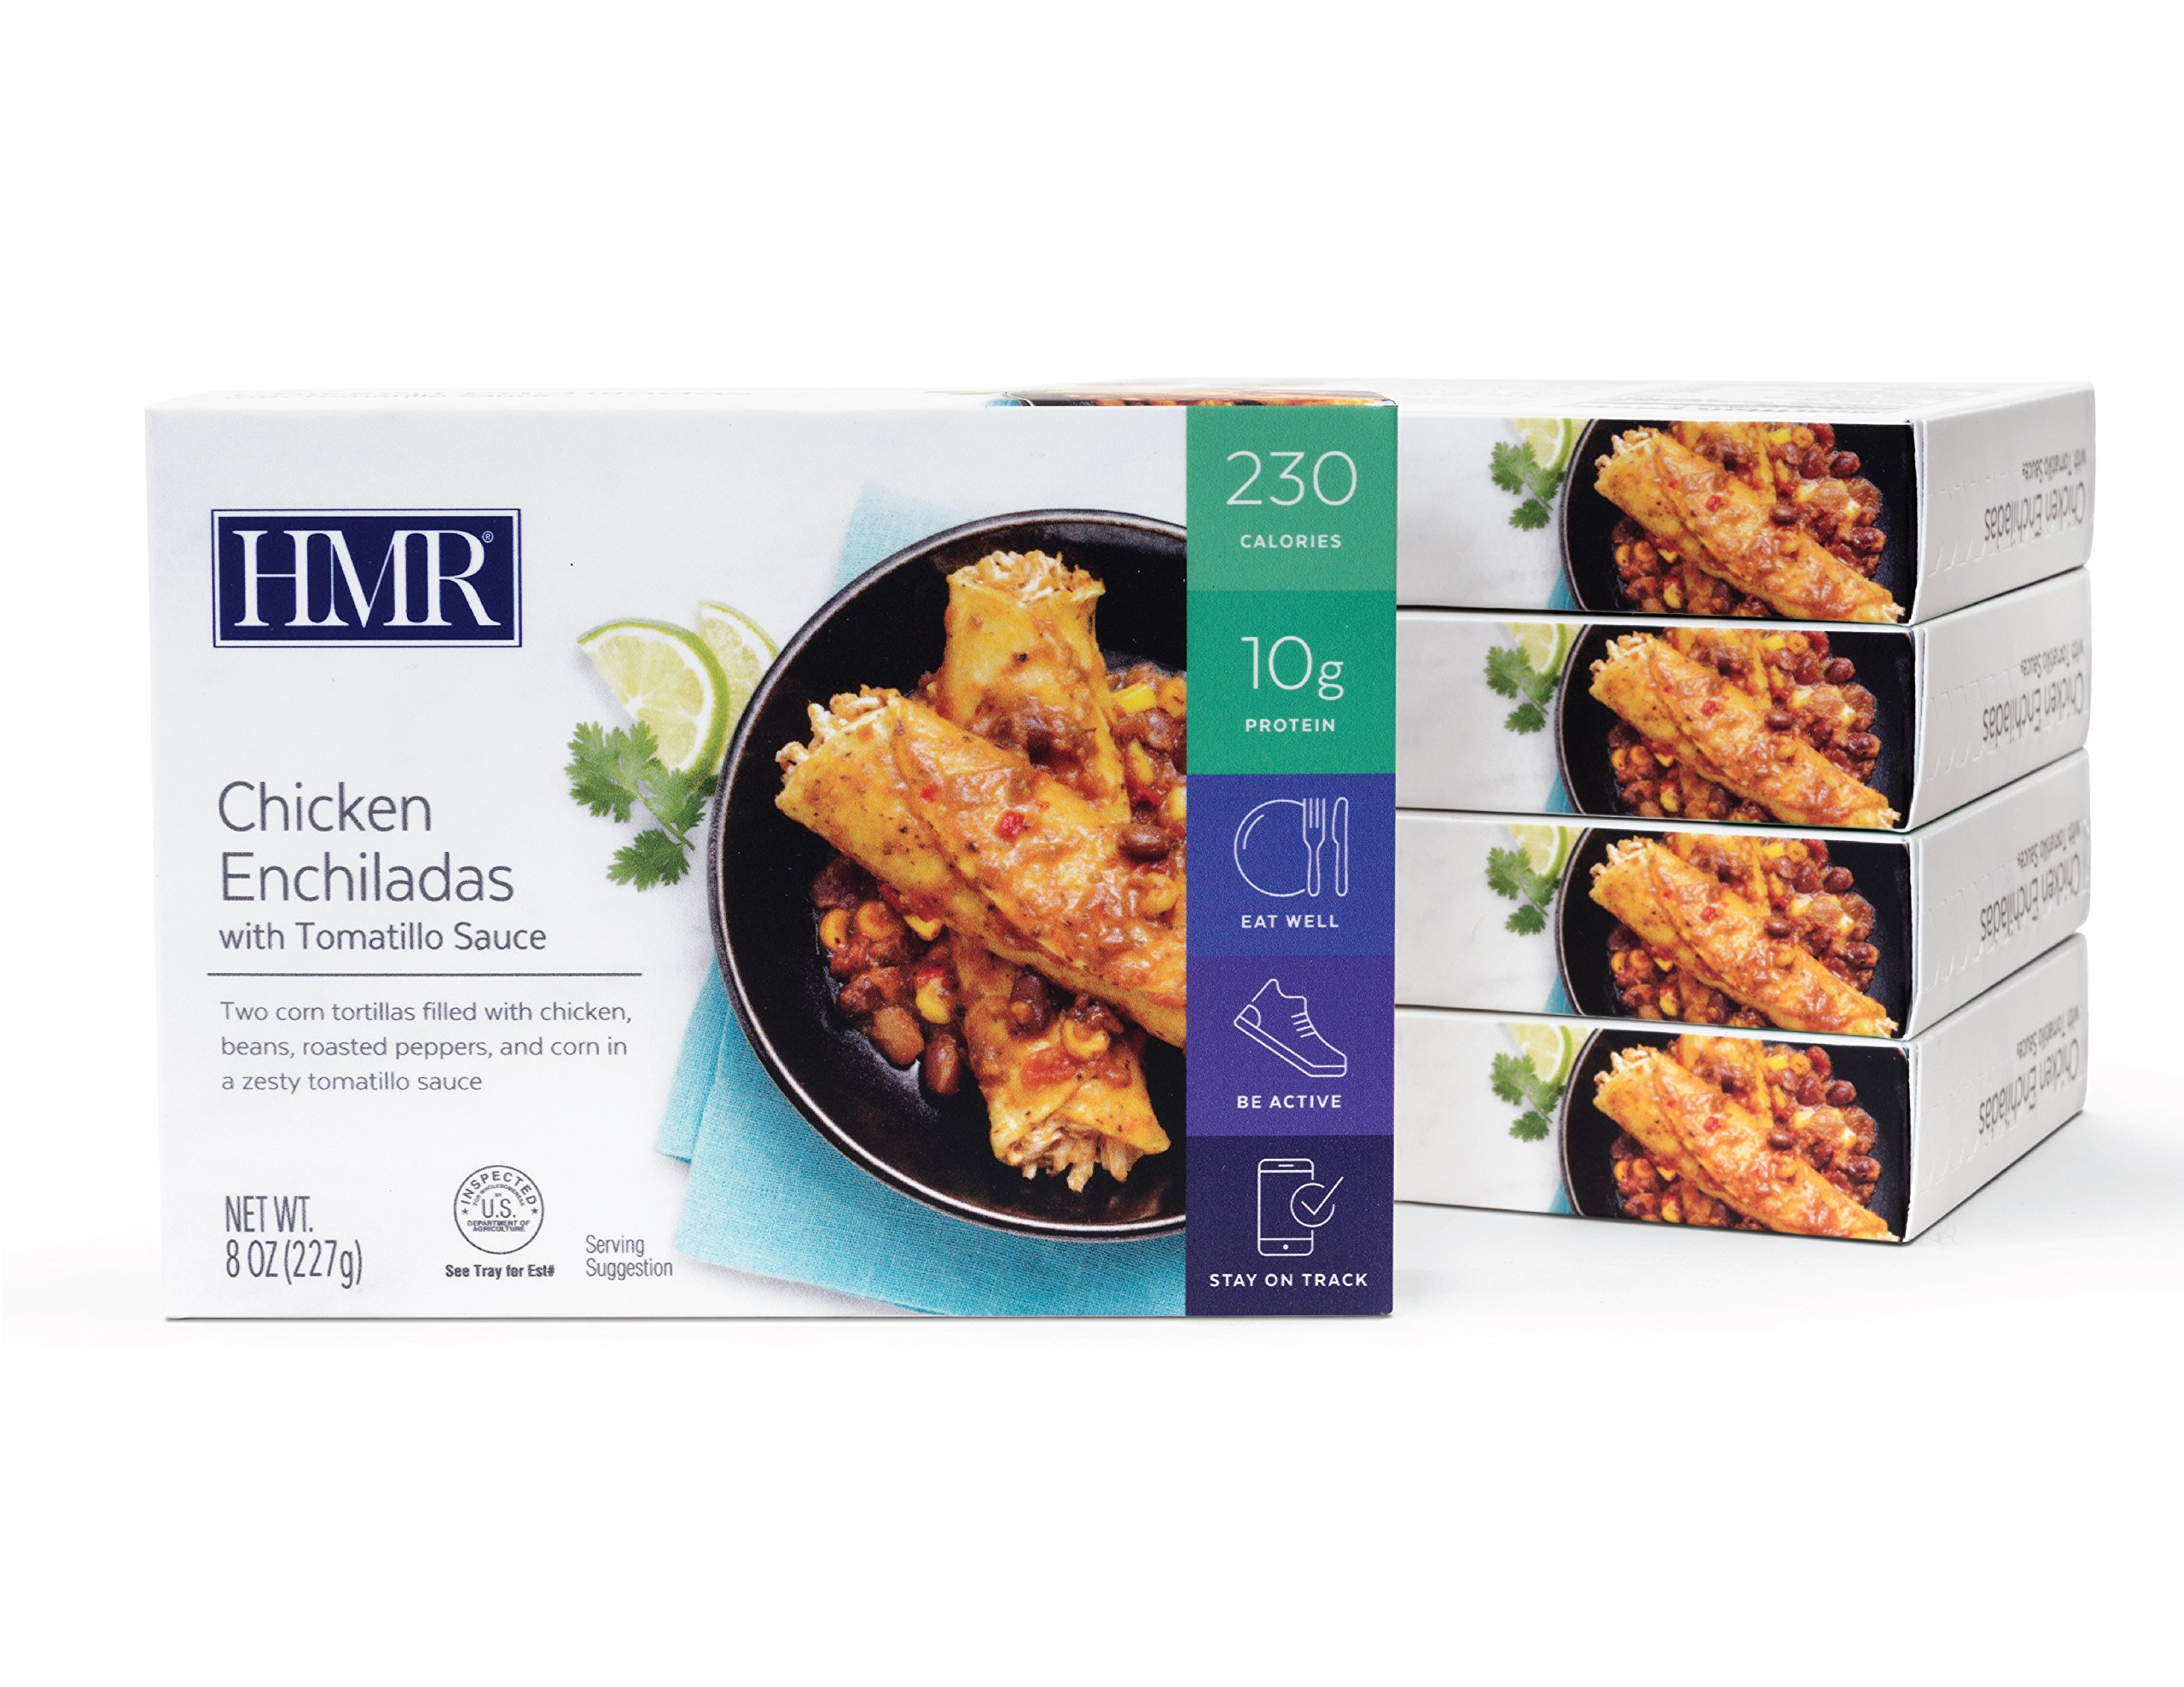 HMR Chicken Enchiladas with Tomatillo Sauce Entree, 8 oz. servings, 5 count by HMR